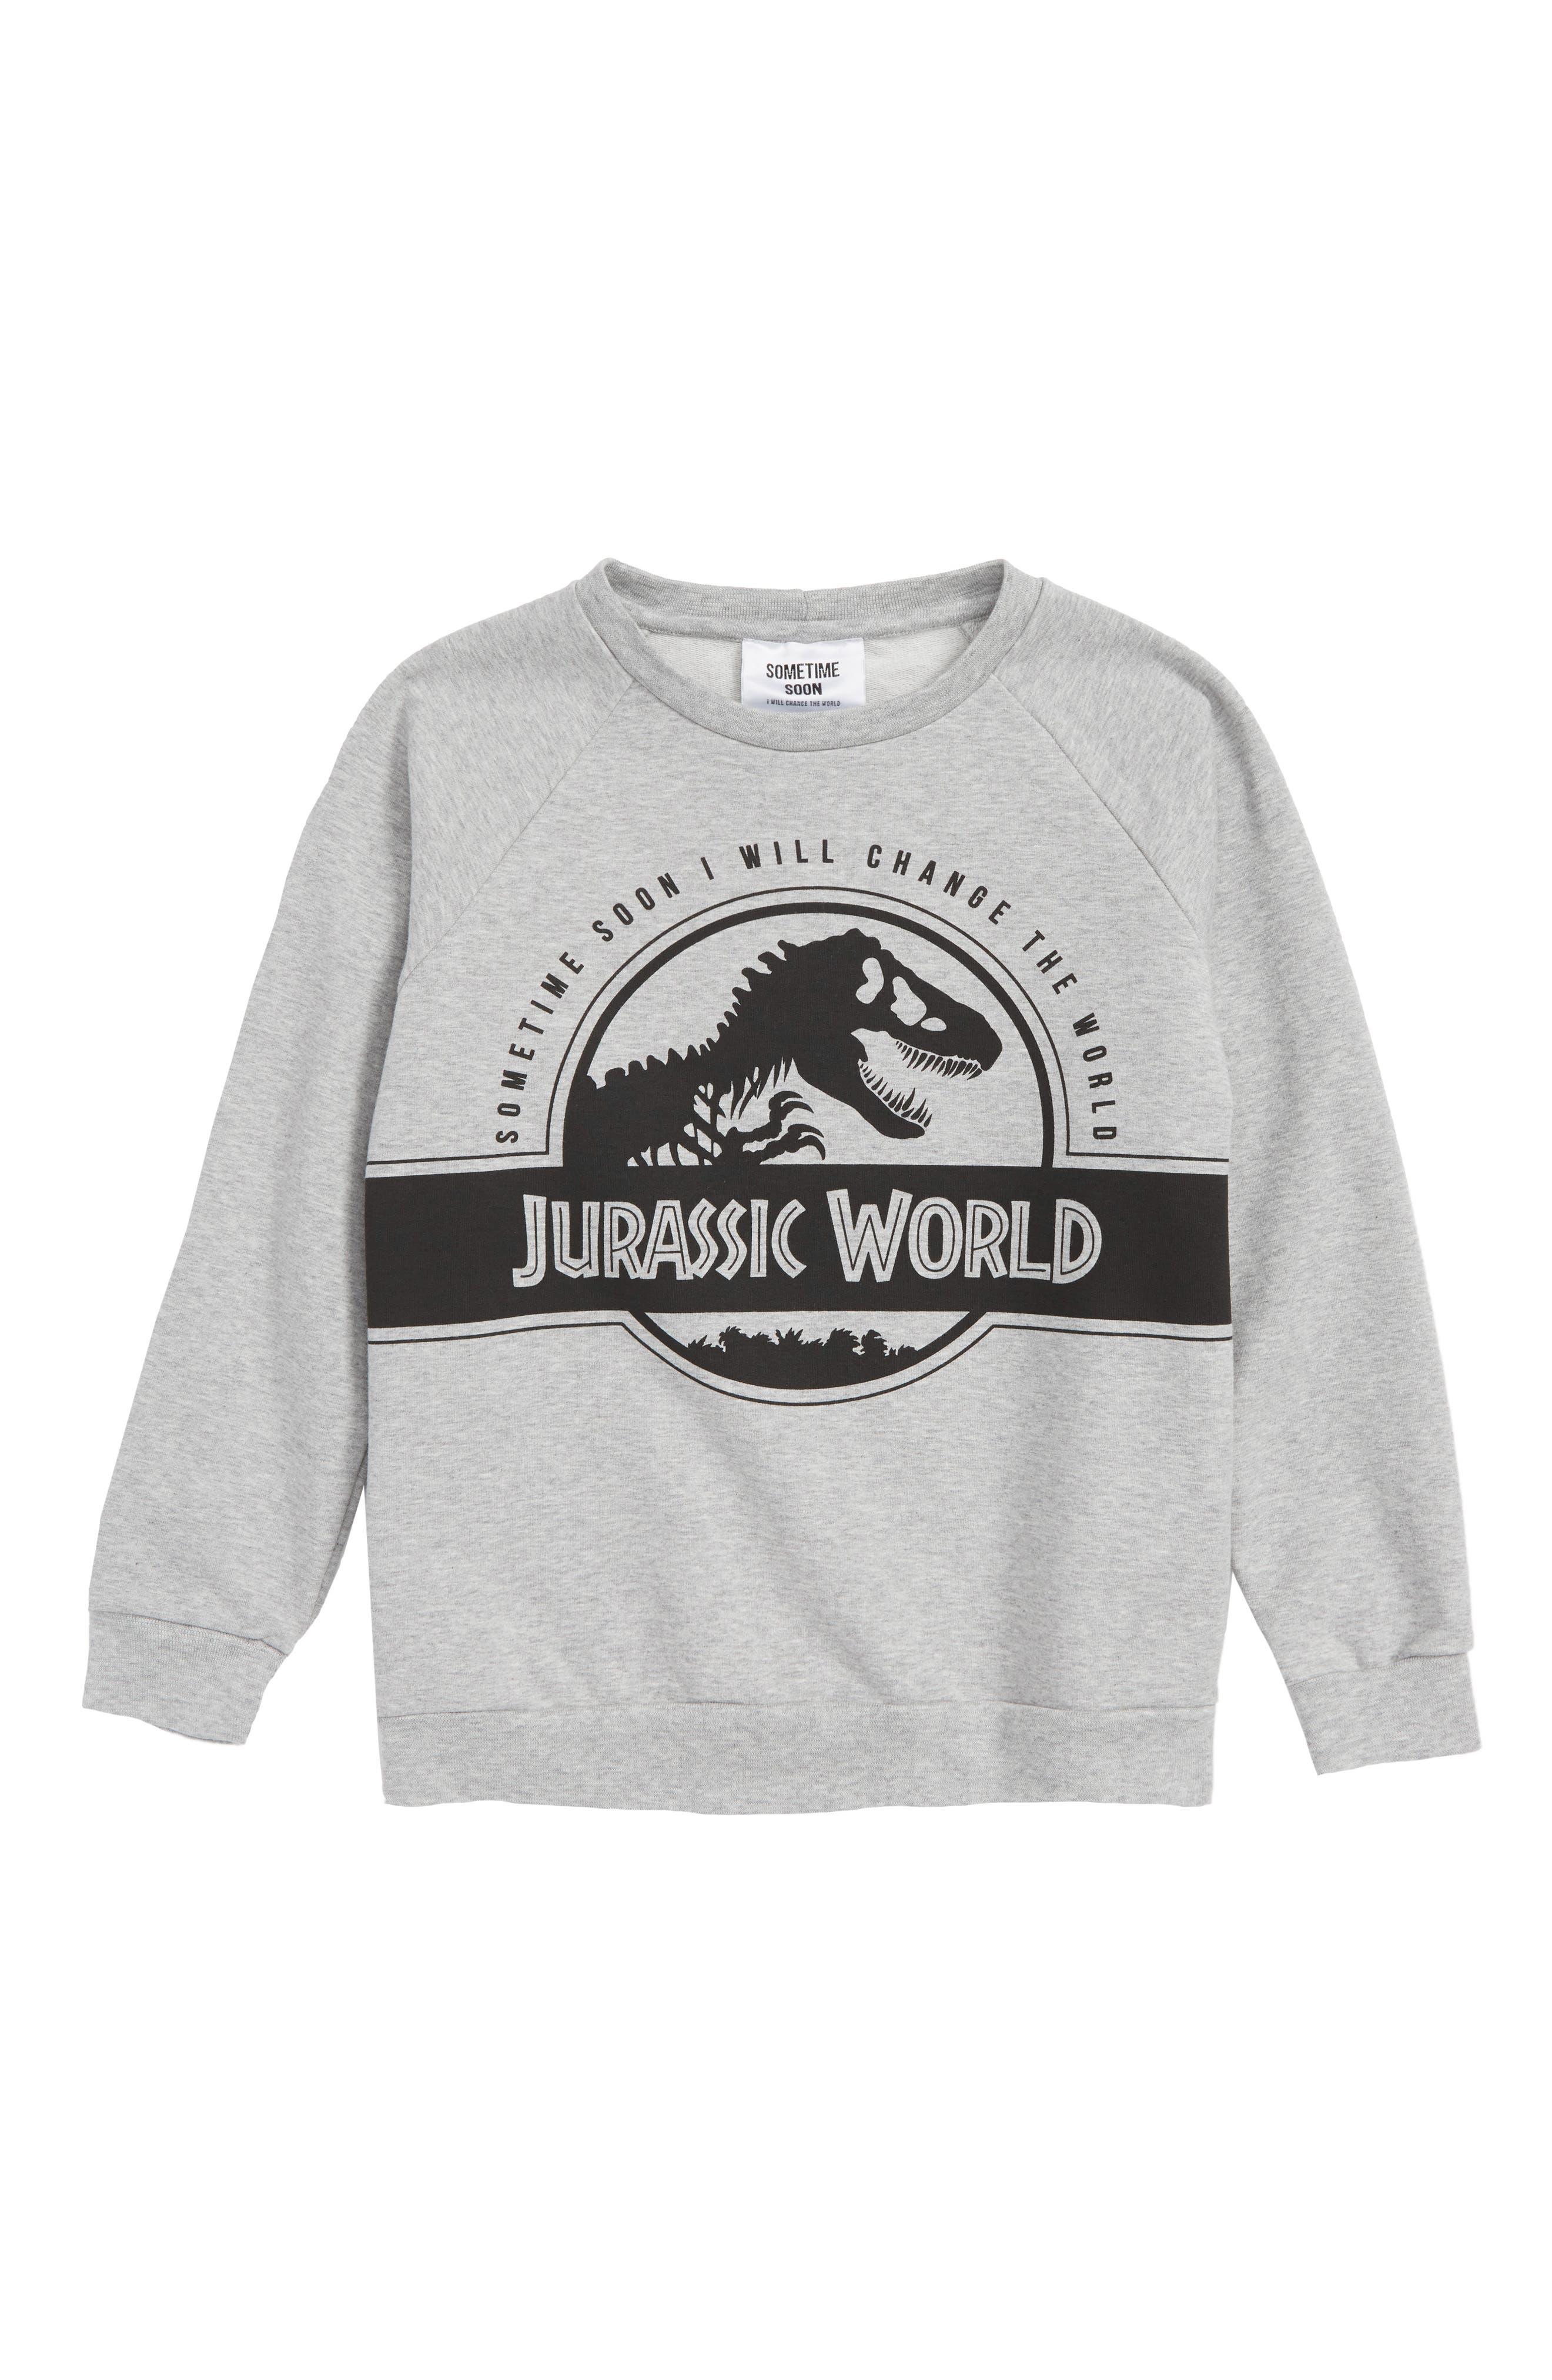 x Jurassic World Rex Graphic Organic Cotton Sweatshirt,                         Main,                         color, 020